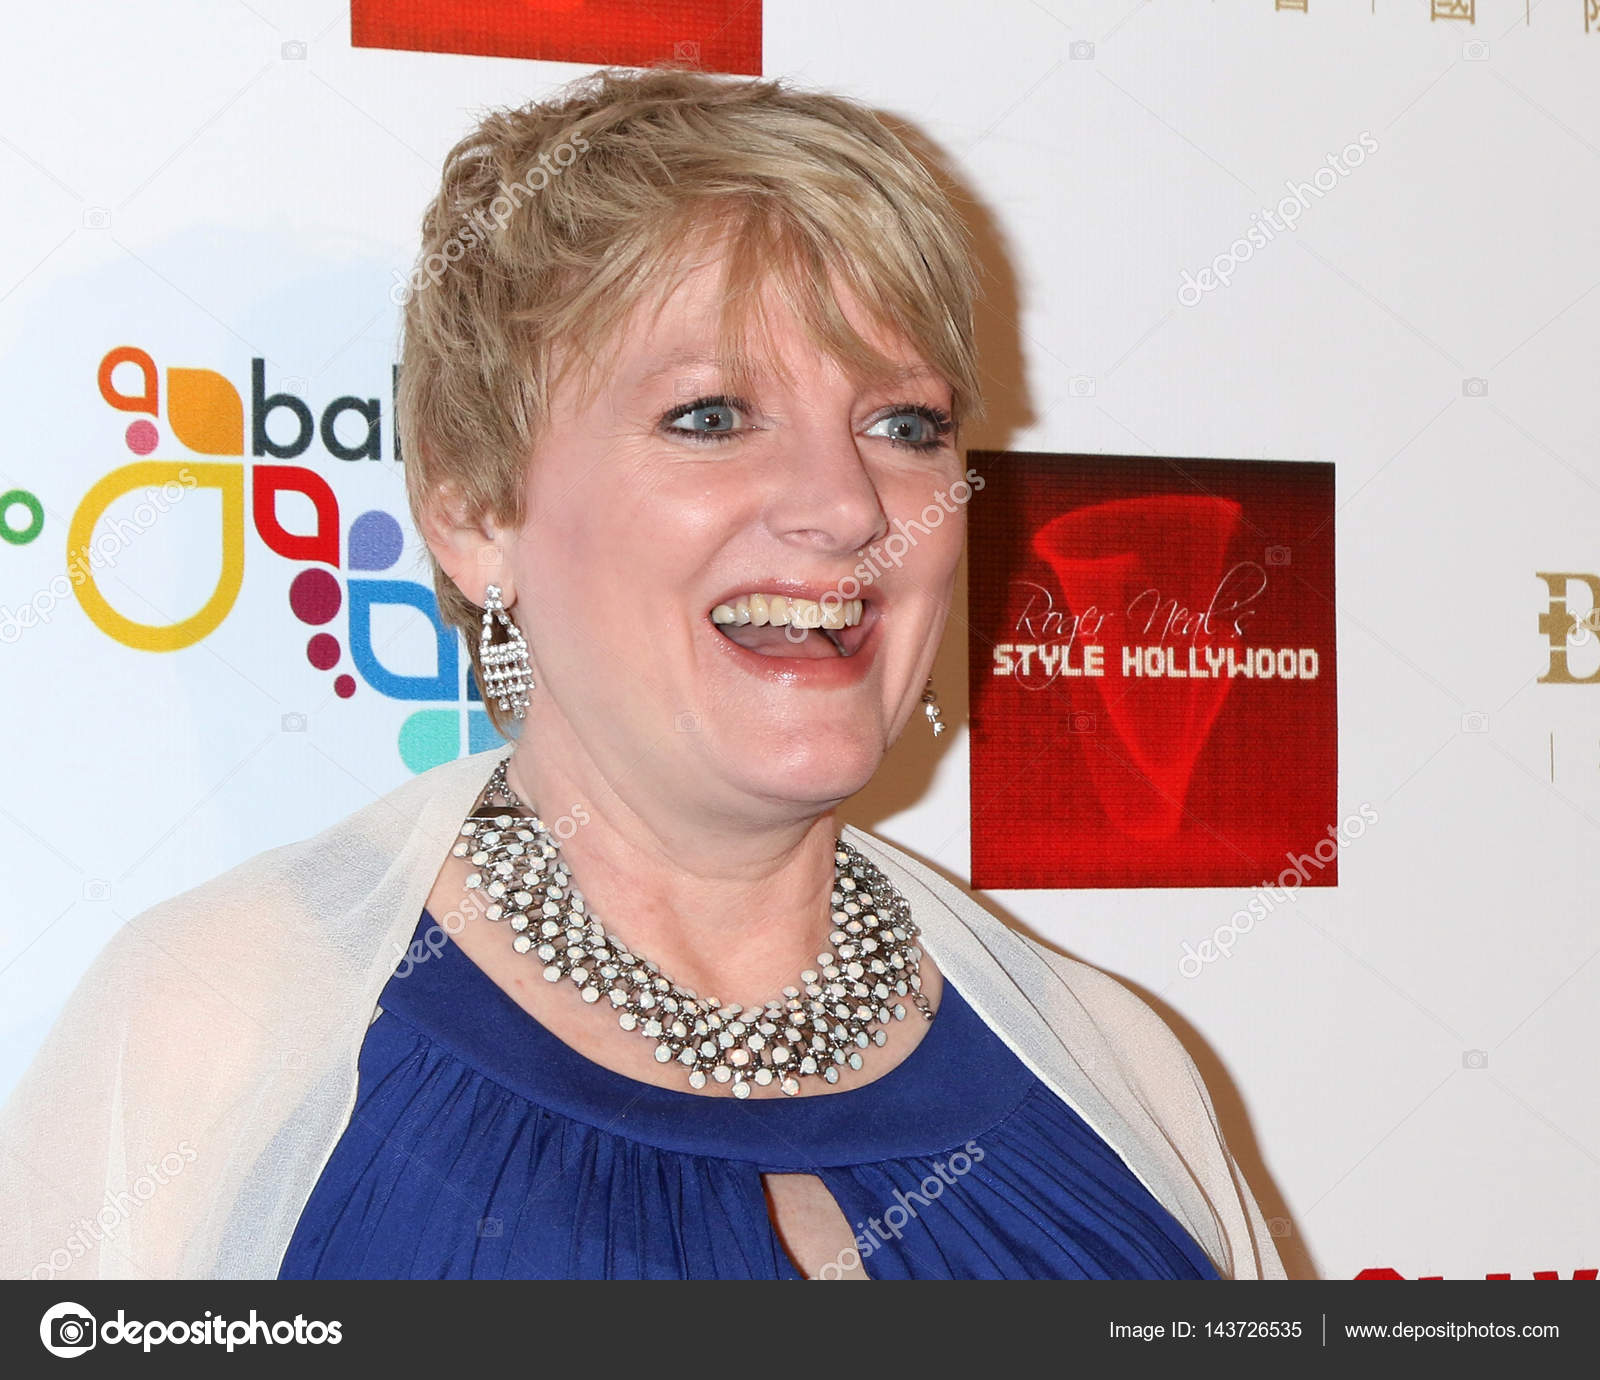 Norma Terris,Billie Piper (born 1982) Adult videos Helen Dallimore,Me Me Lai